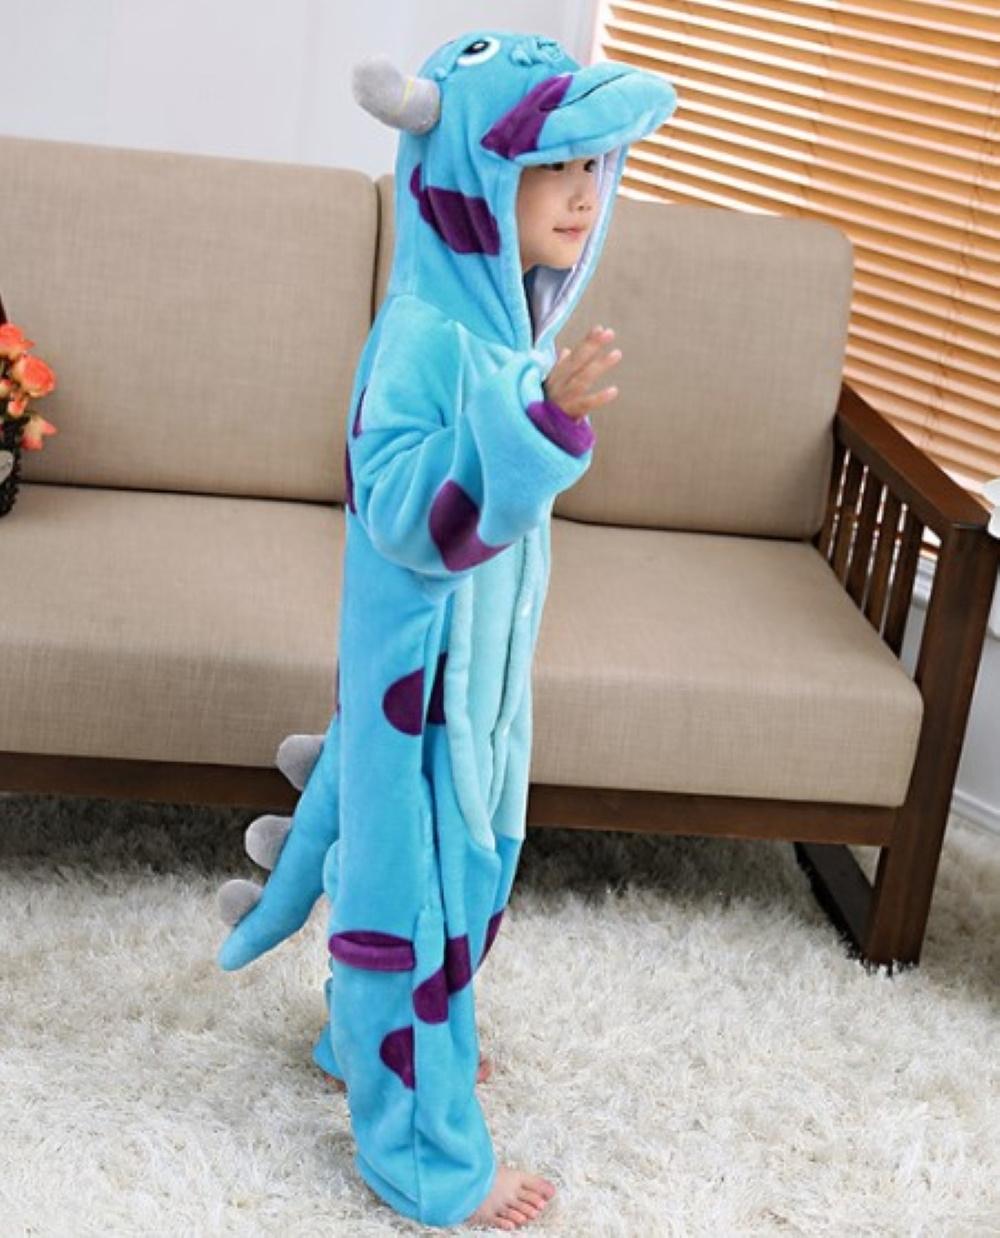 Emmarcon-pigiama-intero-animale-kigurumi-da-bambini-stella-arcobaleno-chiusura-i miniatura 48